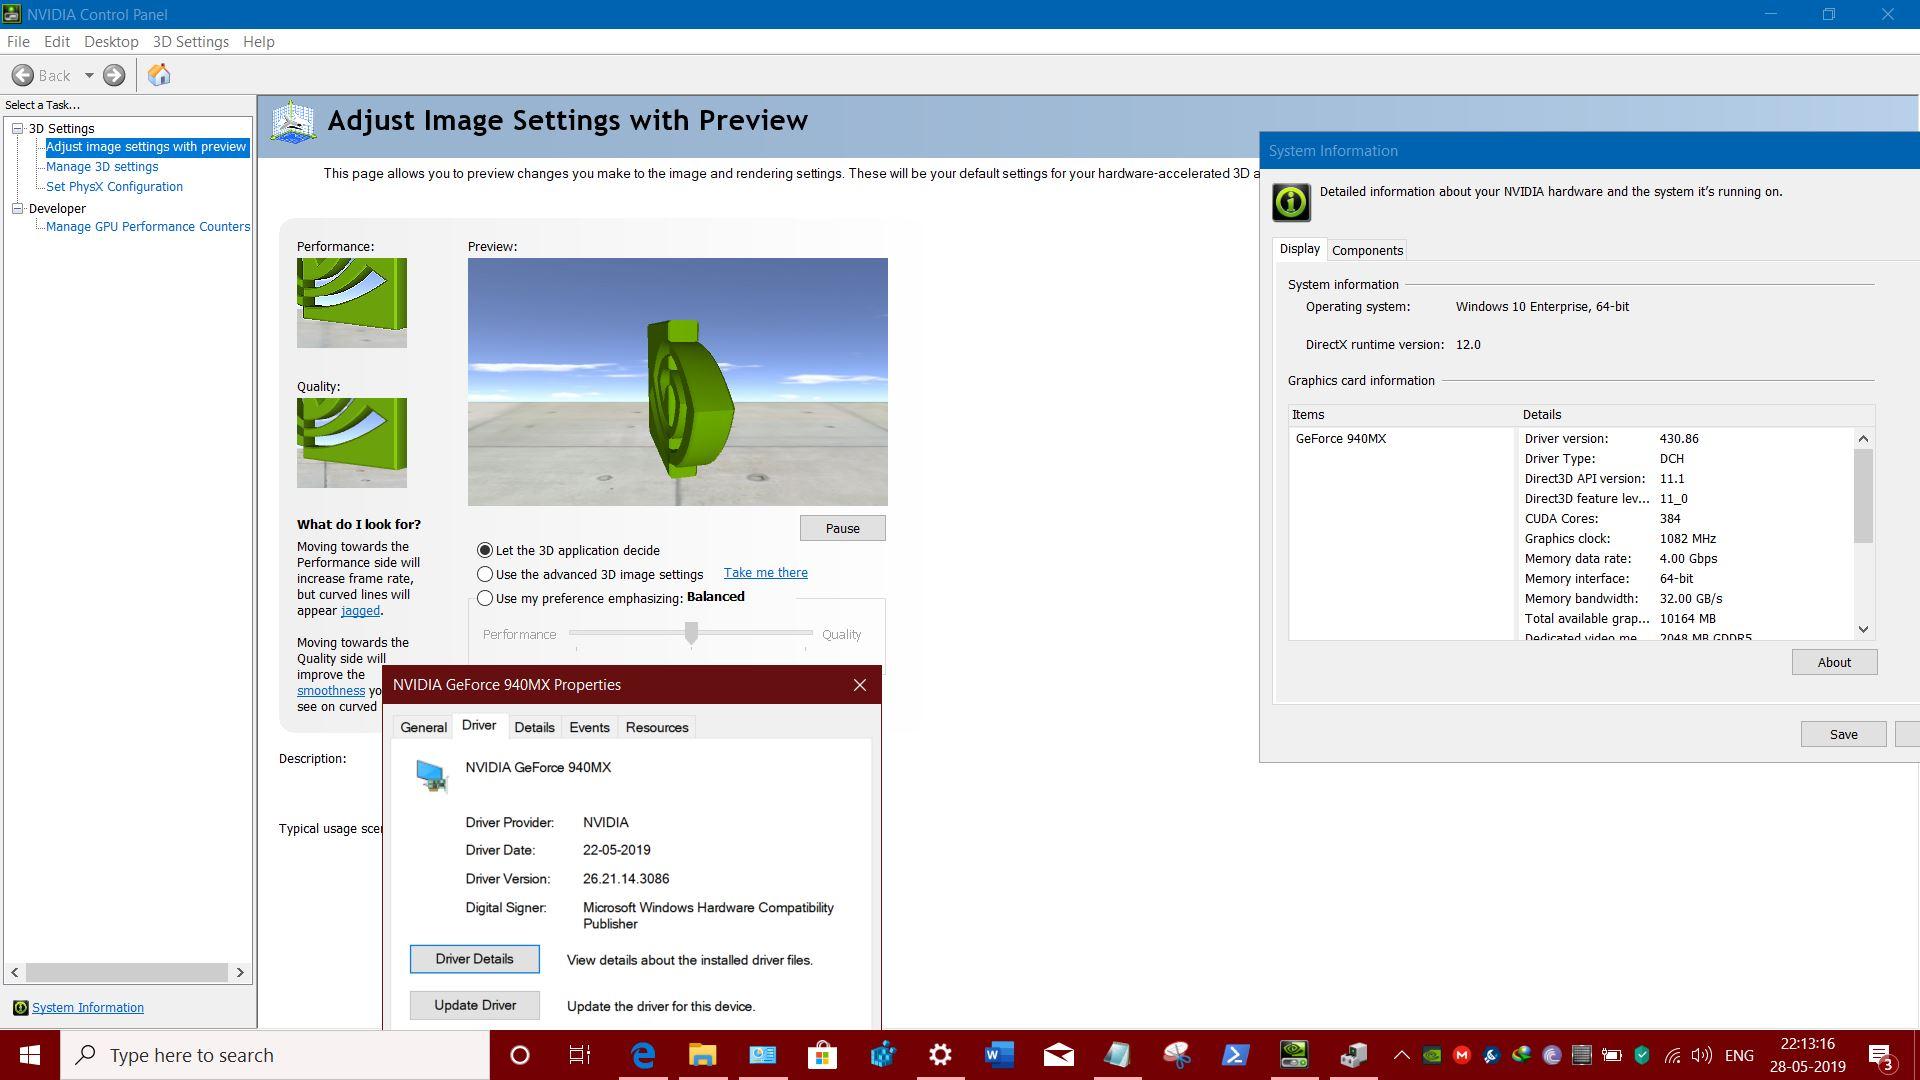 Nvidia Inc Released new Geforce DCH & STANDARD WHQL Driver v445.87 for Notebooks GPU'S &... fd89d2cc-1081-4ff9-b3bf-3c7e4dc79b3c?upload=true.jpg